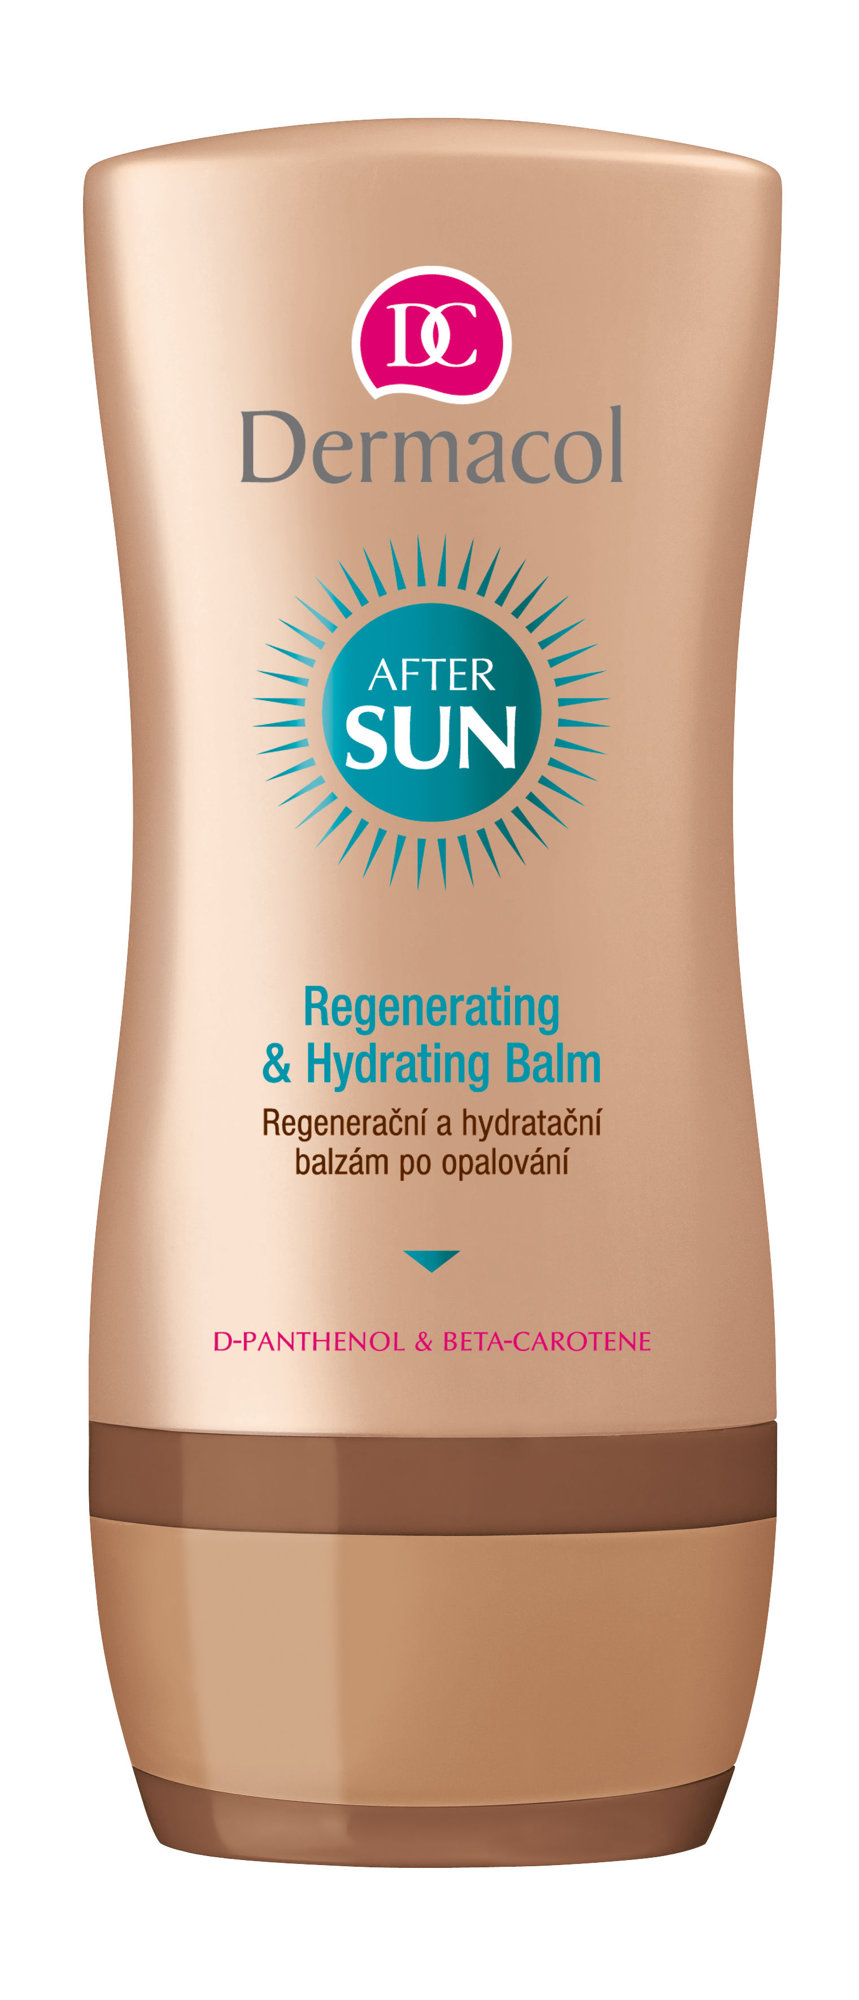 Apsaugai nuo saulės Dermacol After Sun Regenerating & Hydrating Balm